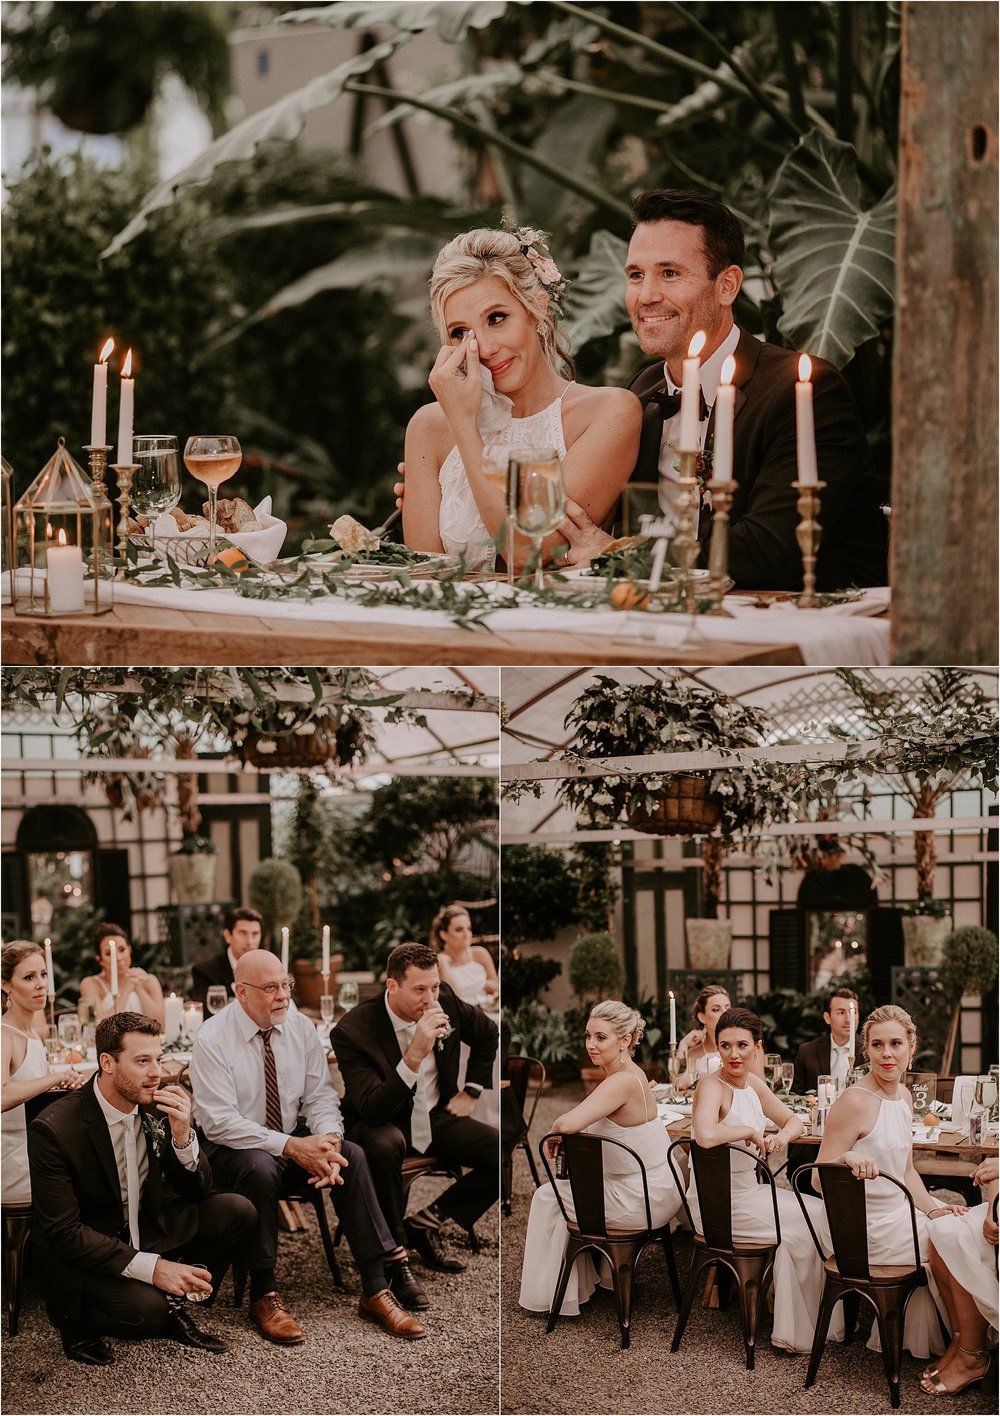 Sarah_Brookhart_Hortulus_Farm_Garden_and_Nursey_Wedding_Photographer_0072.jpg